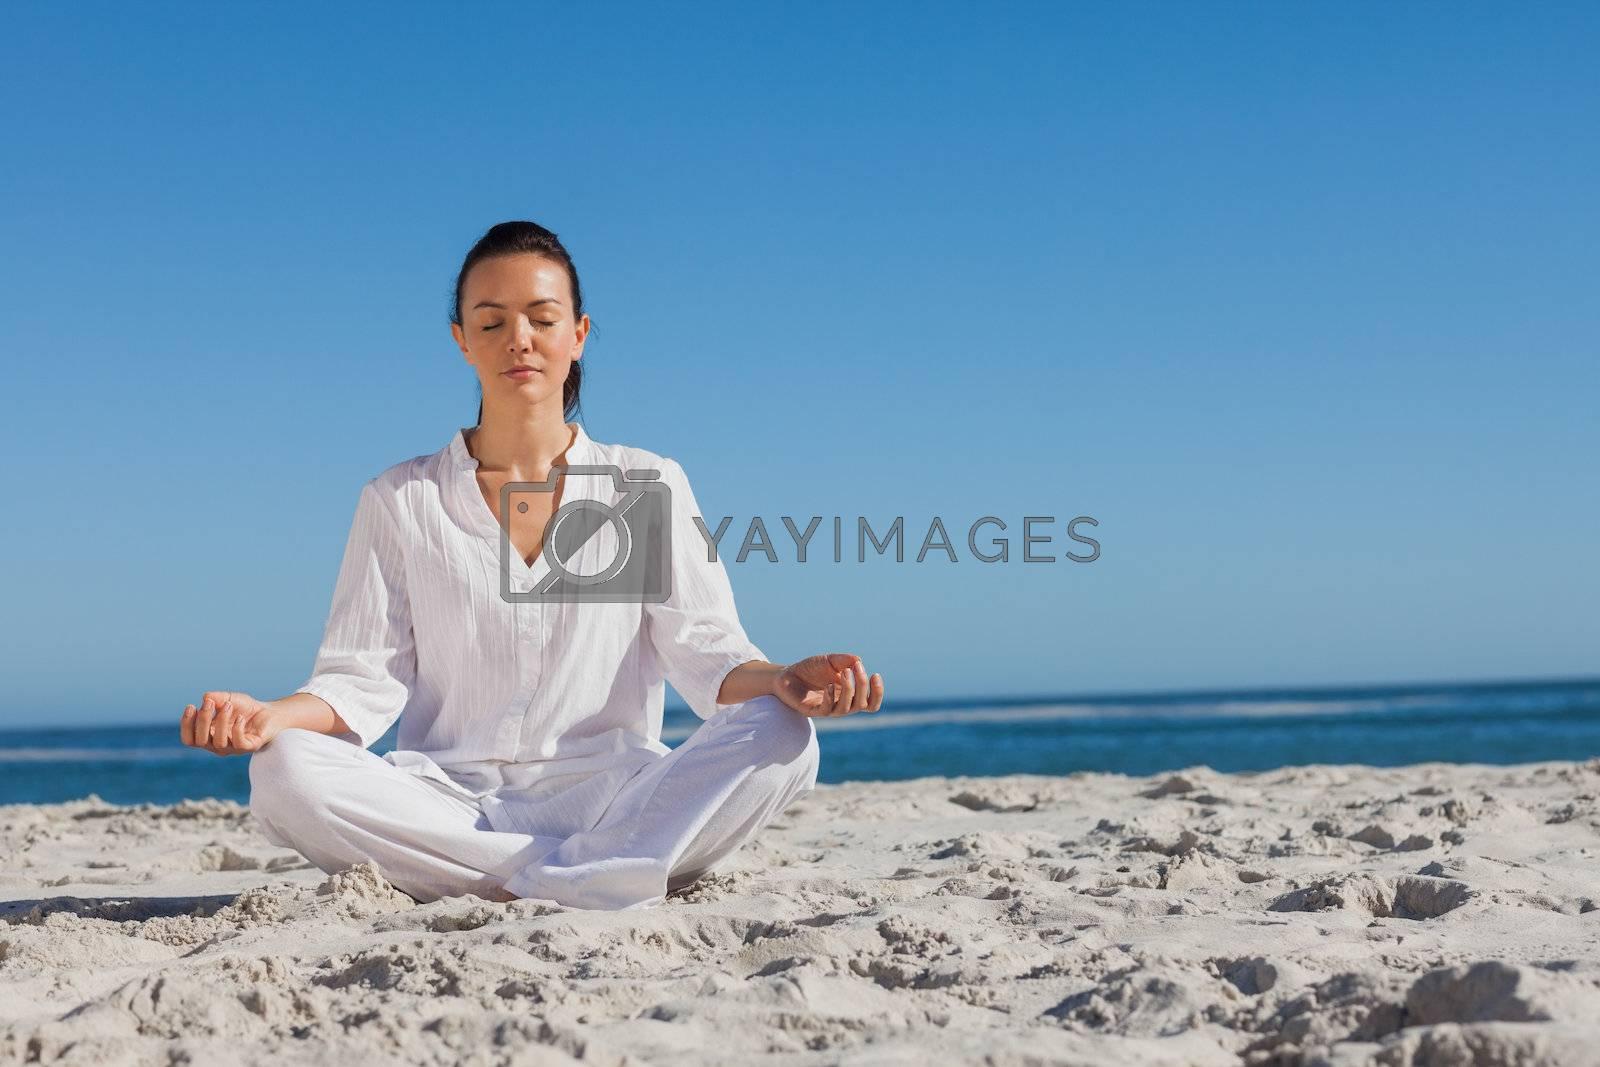 Woman in white doing yoga on the beach by Wavebreakmedia